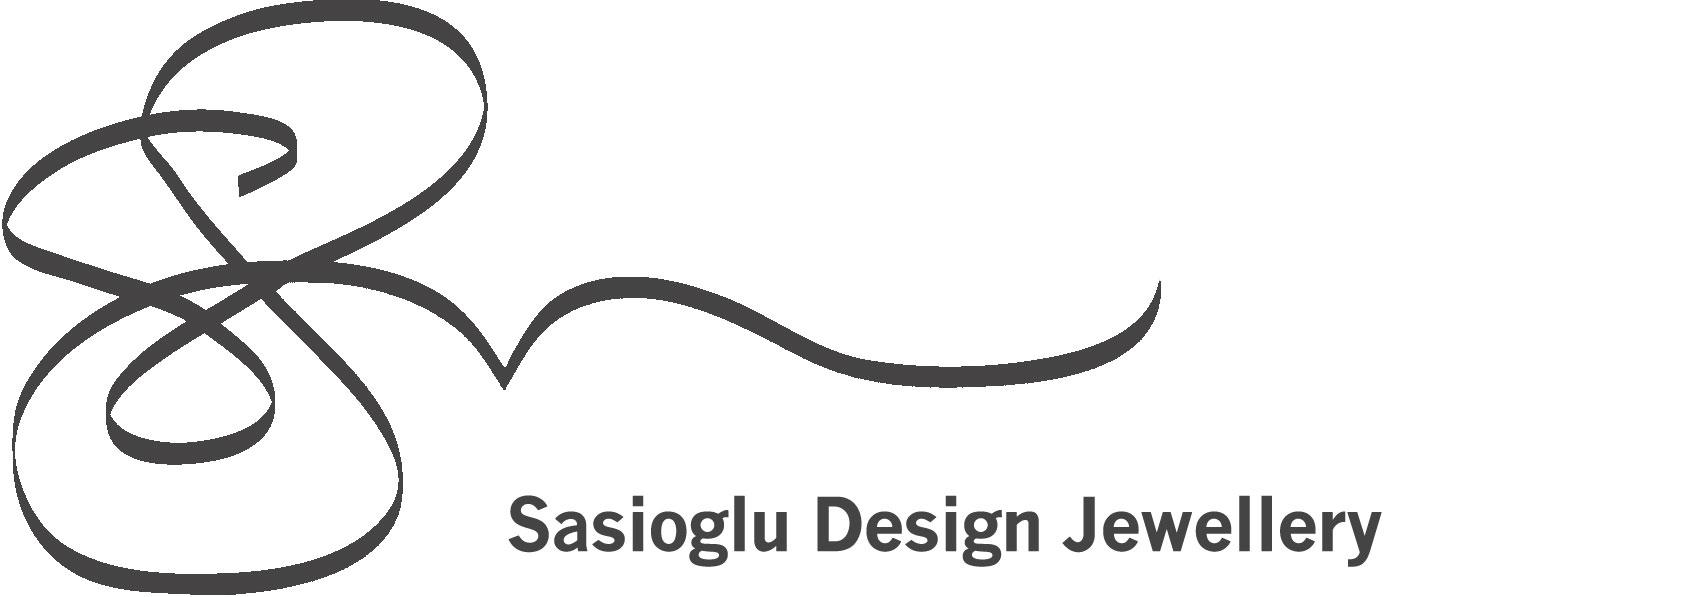 Sasioglu Design